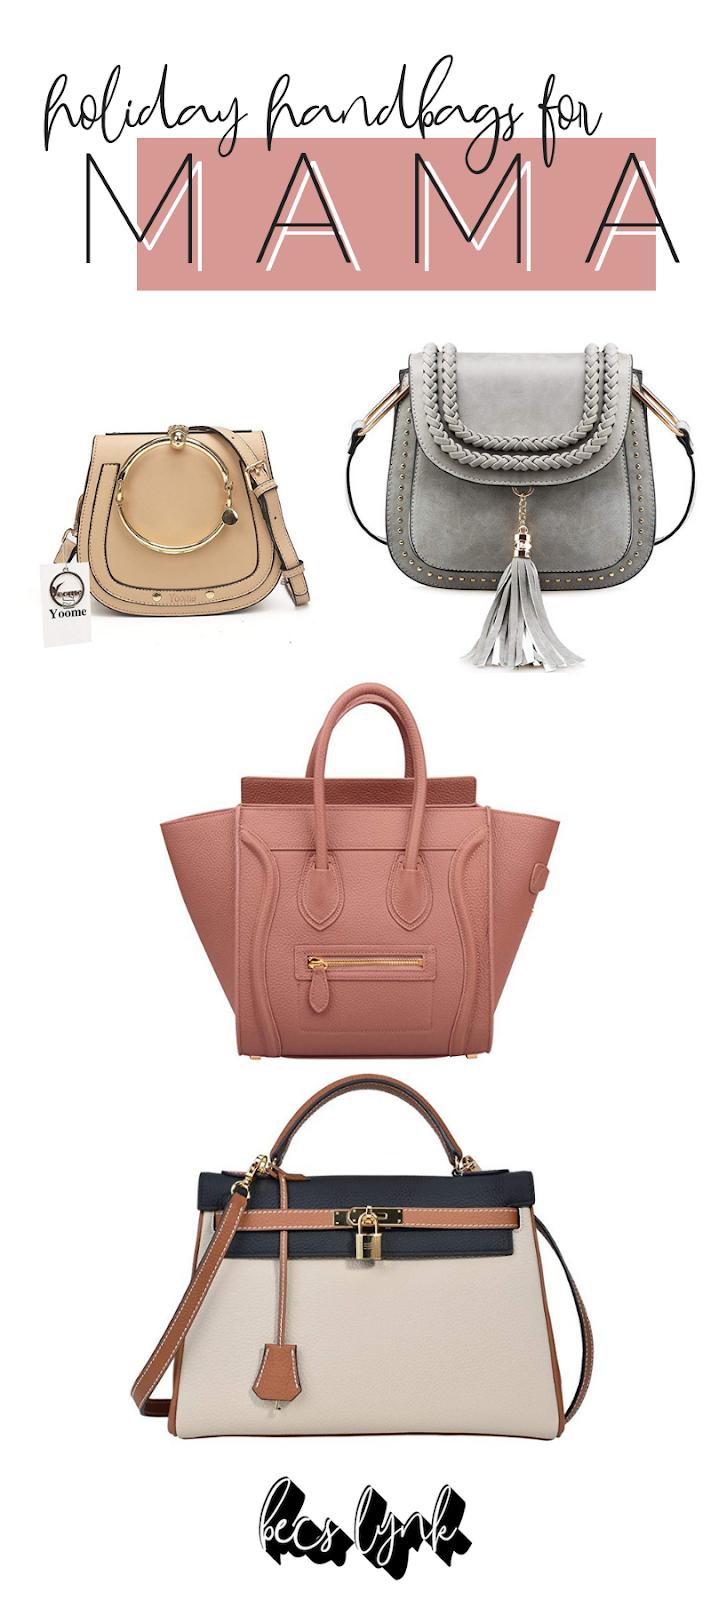 Holiday Gift Guide 4 Handbags